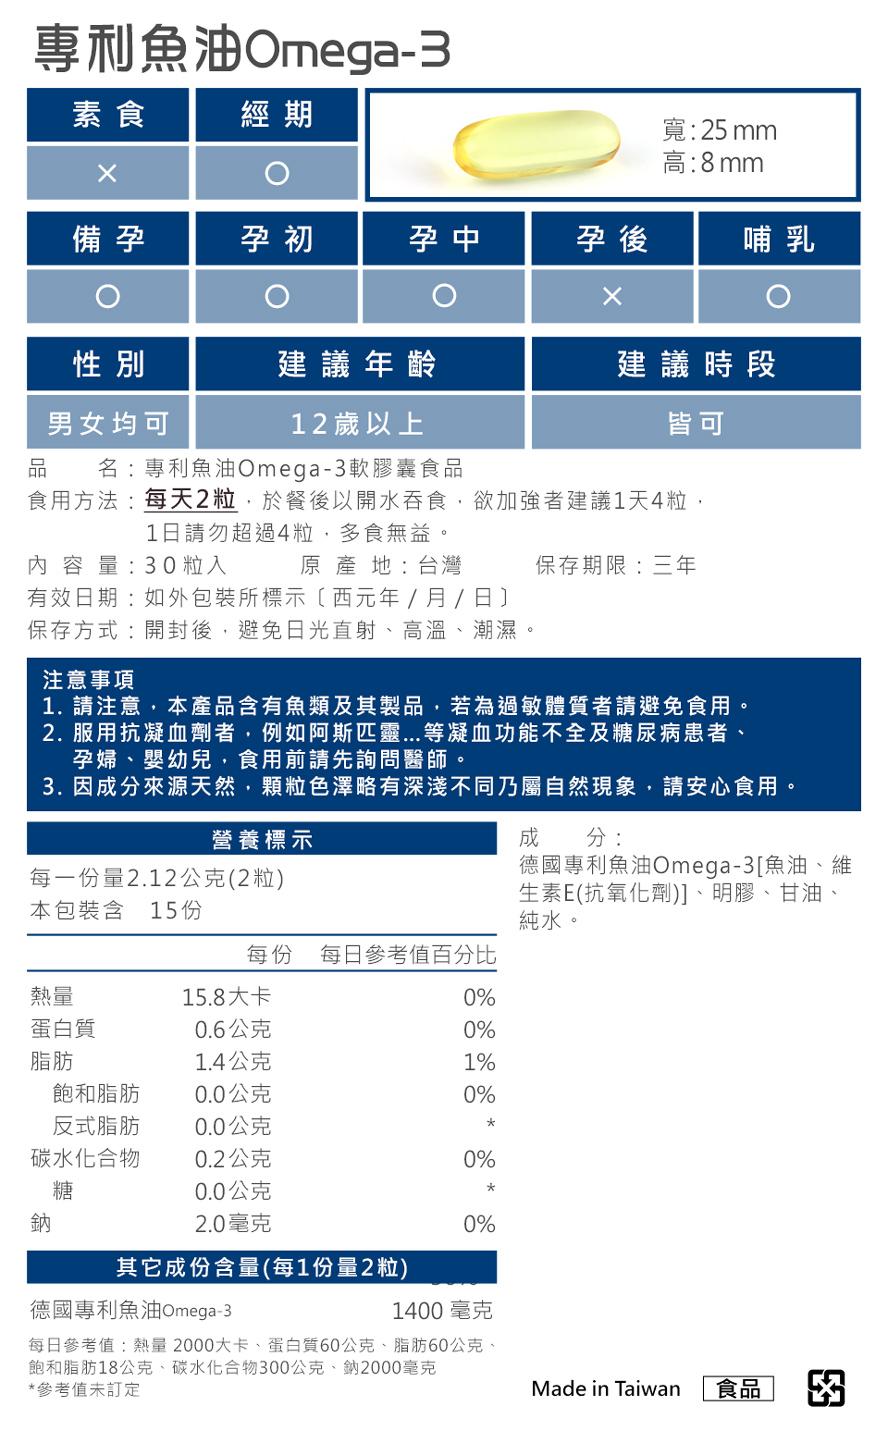 BHK's魚油為TG型態,高劑量高吸收,超越EE型態3倍吸收率